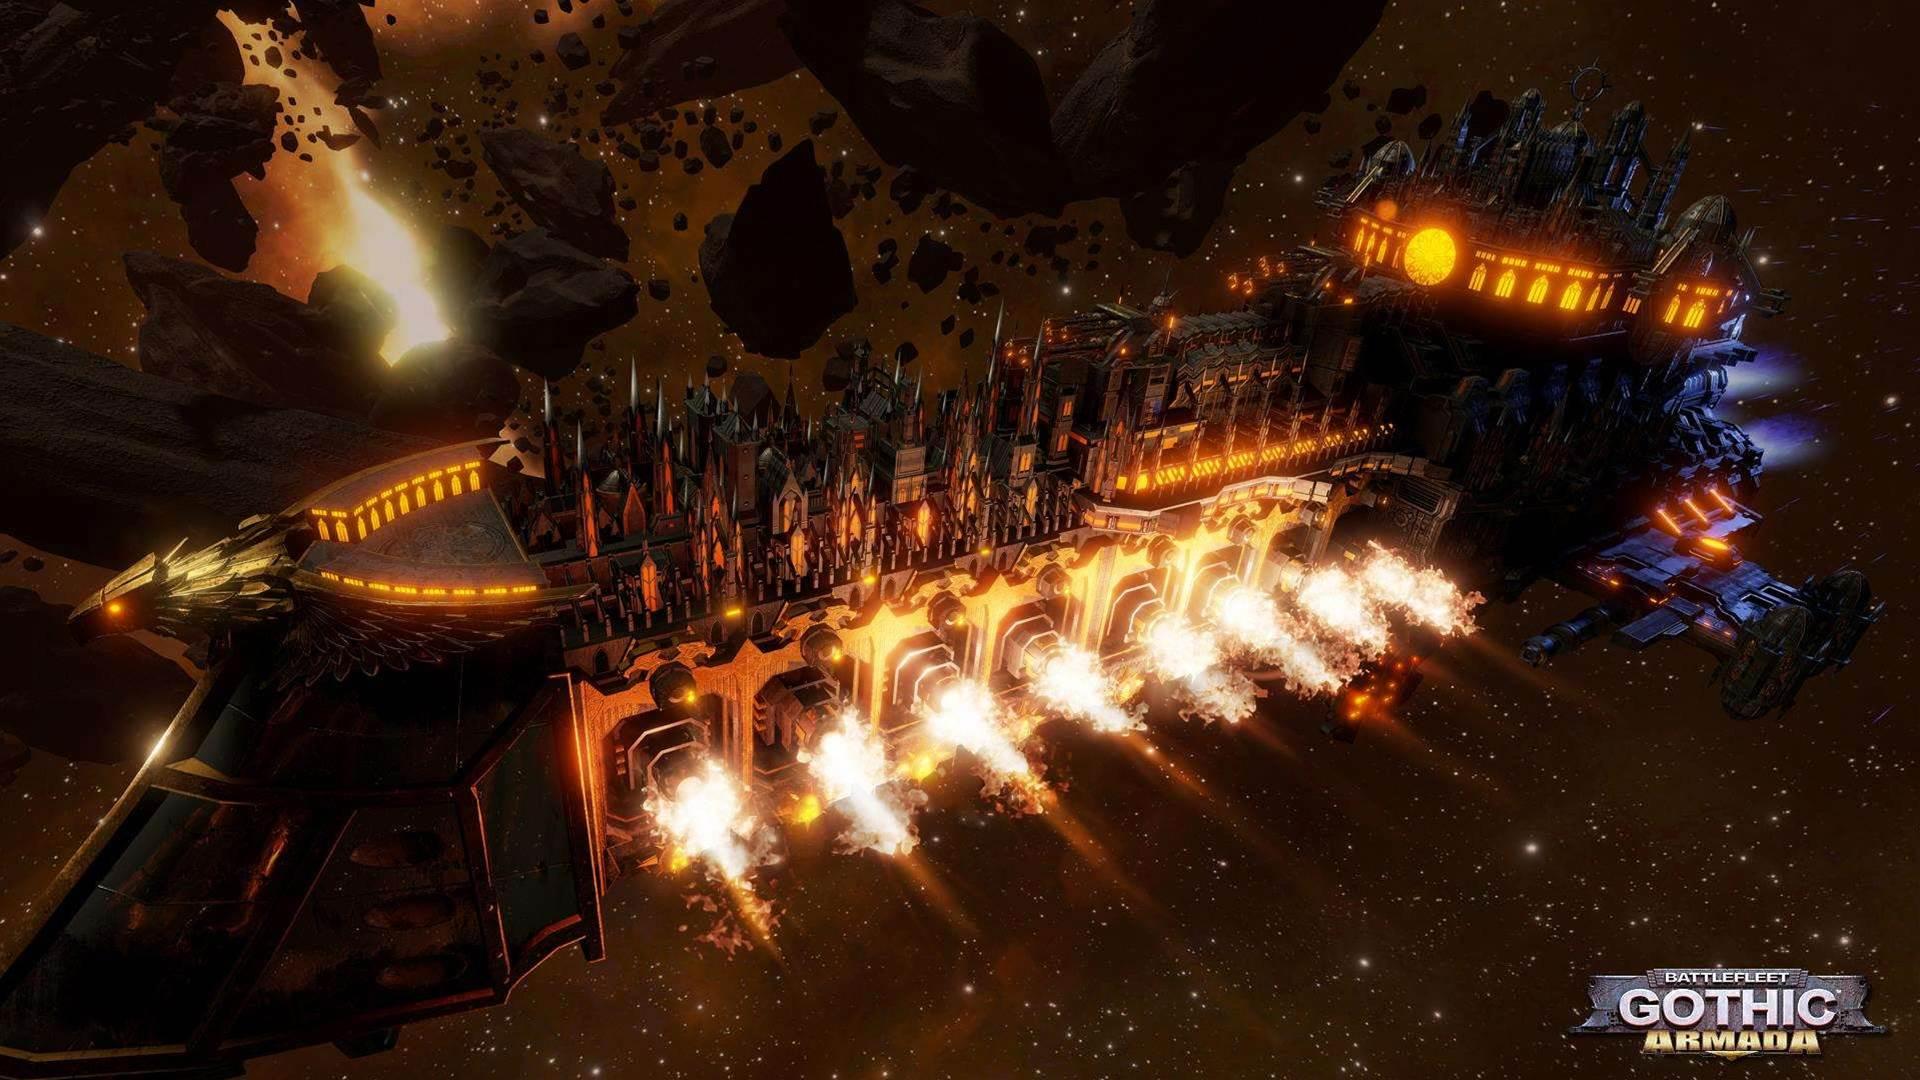 Gorgeous Battlefleet Gothic: Armada screens